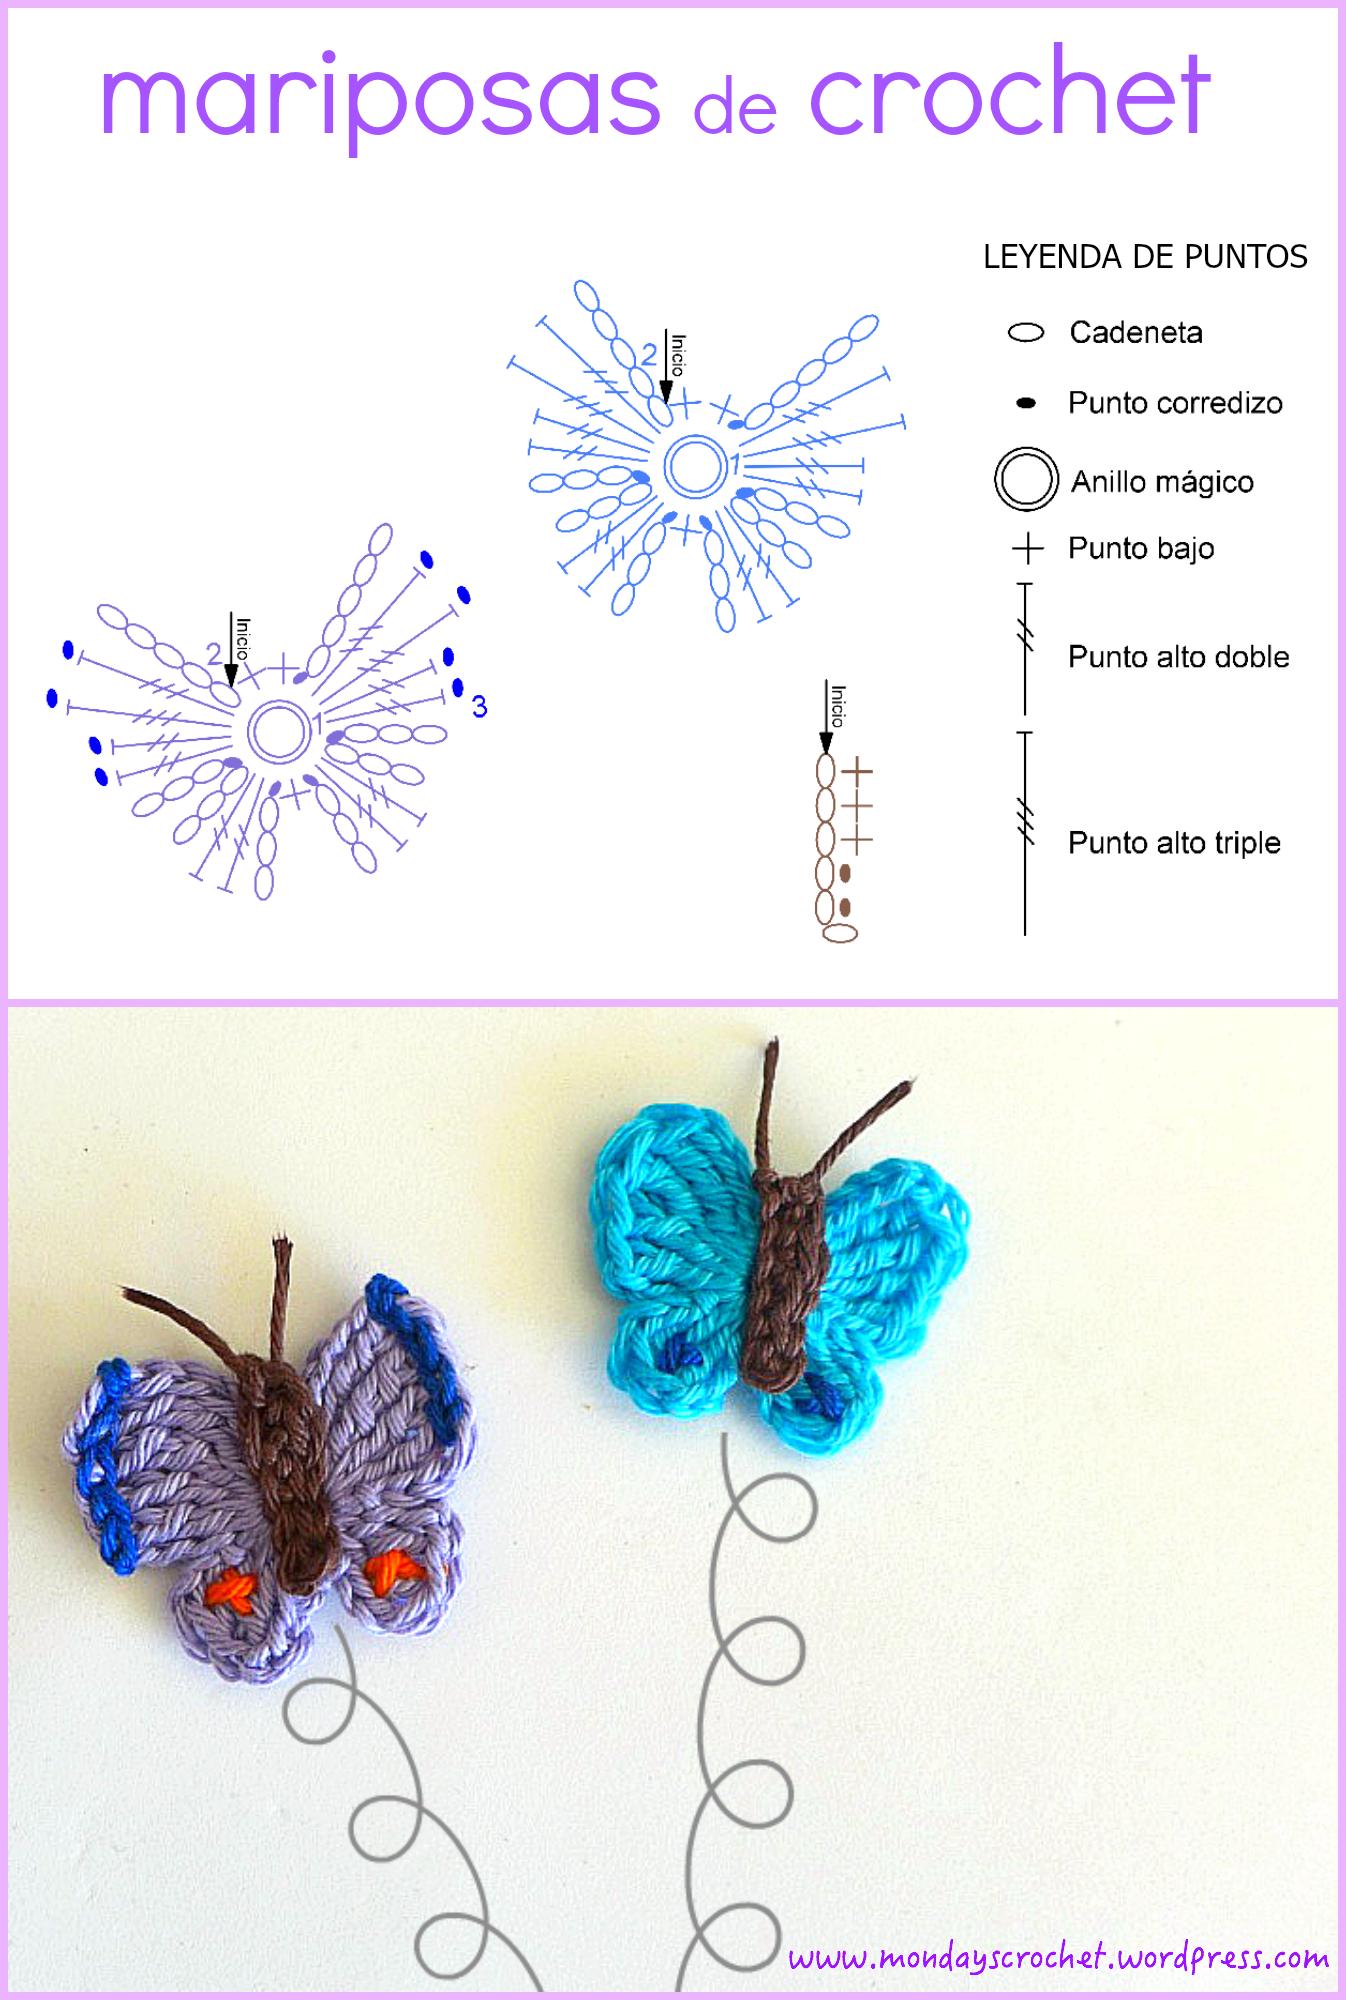 Mariposas de crochet. Patrón gratuito | Diagramas de crochet ...